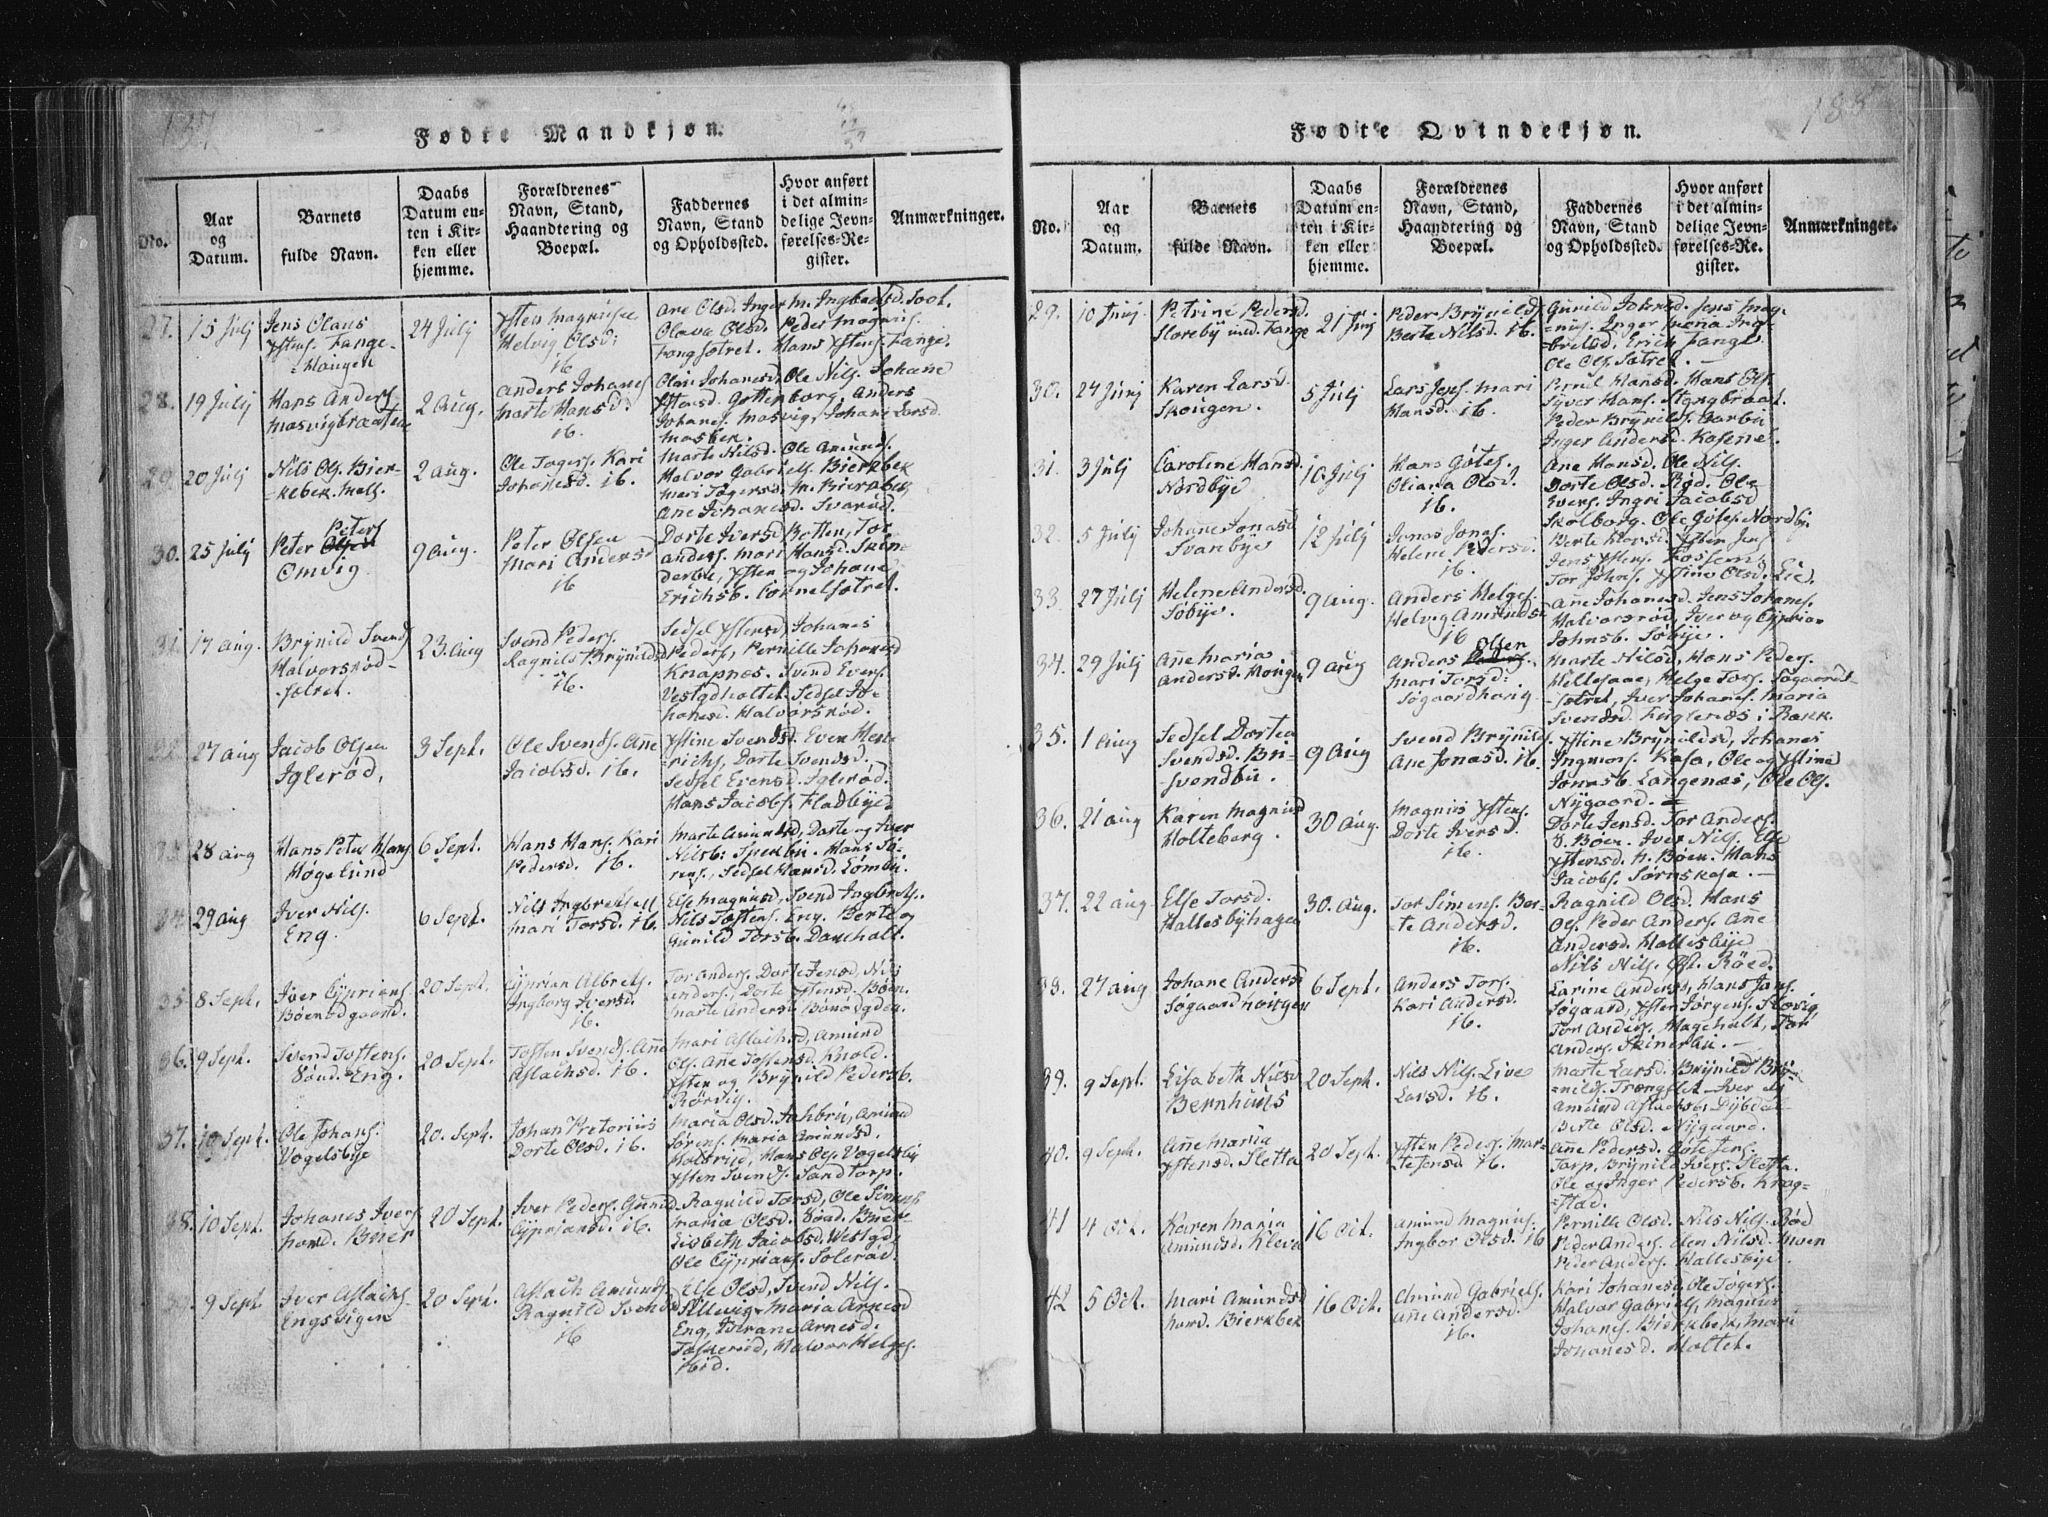 SAO, Aremark prestekontor Kirkebøker, F/Fc/L0001: Ministerialbok nr. III 1, 1814-1834, s. 187-188